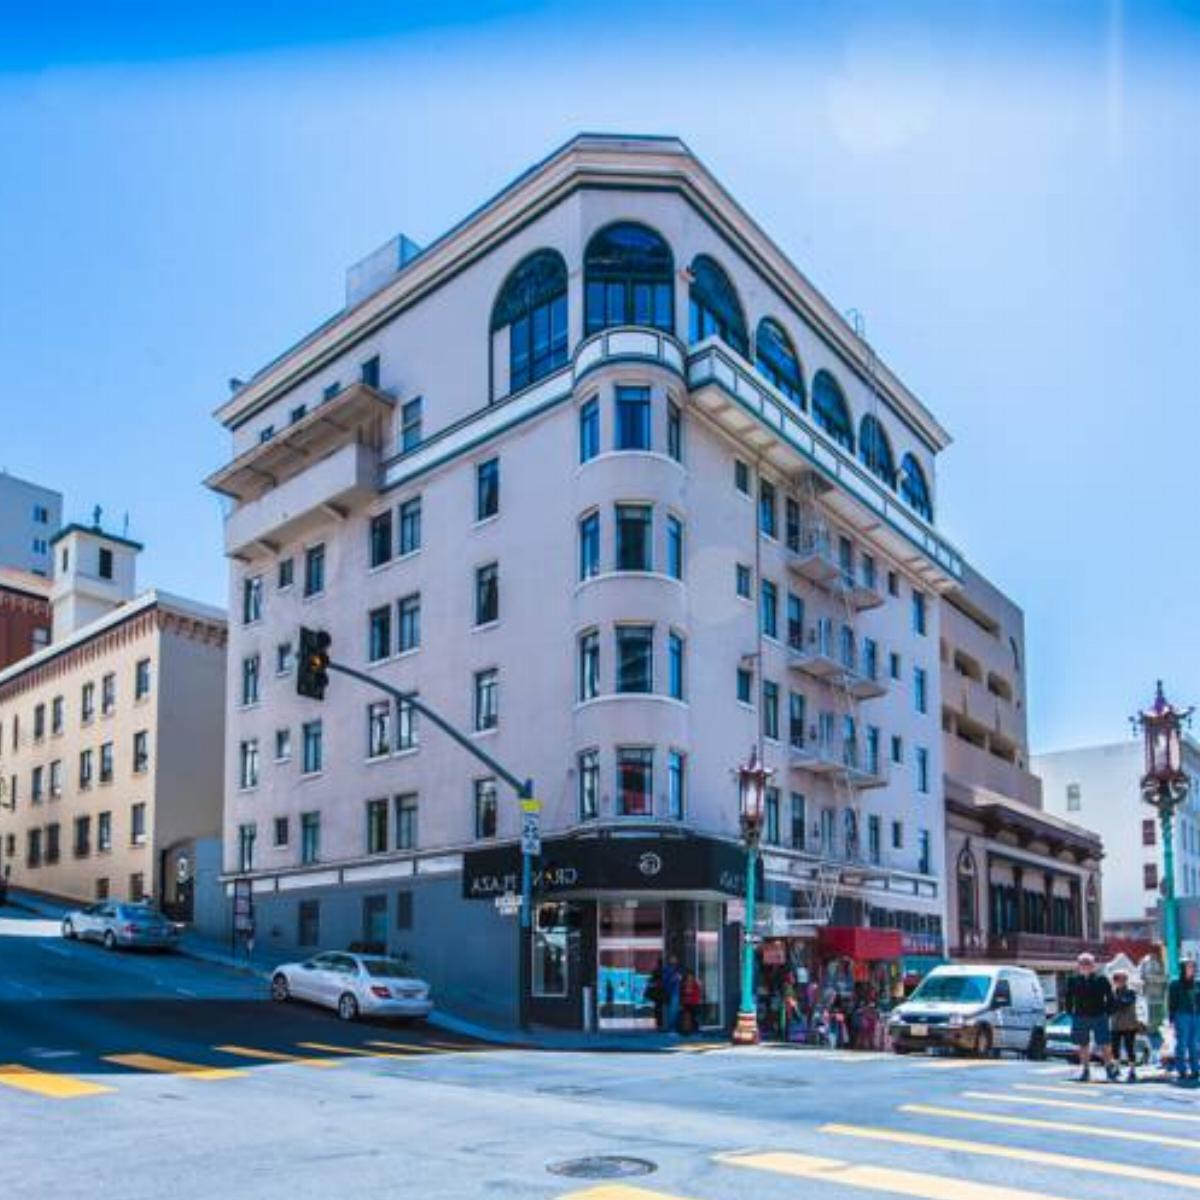 Grant Plaza Hotel Hotel San Francisco Usa Overview